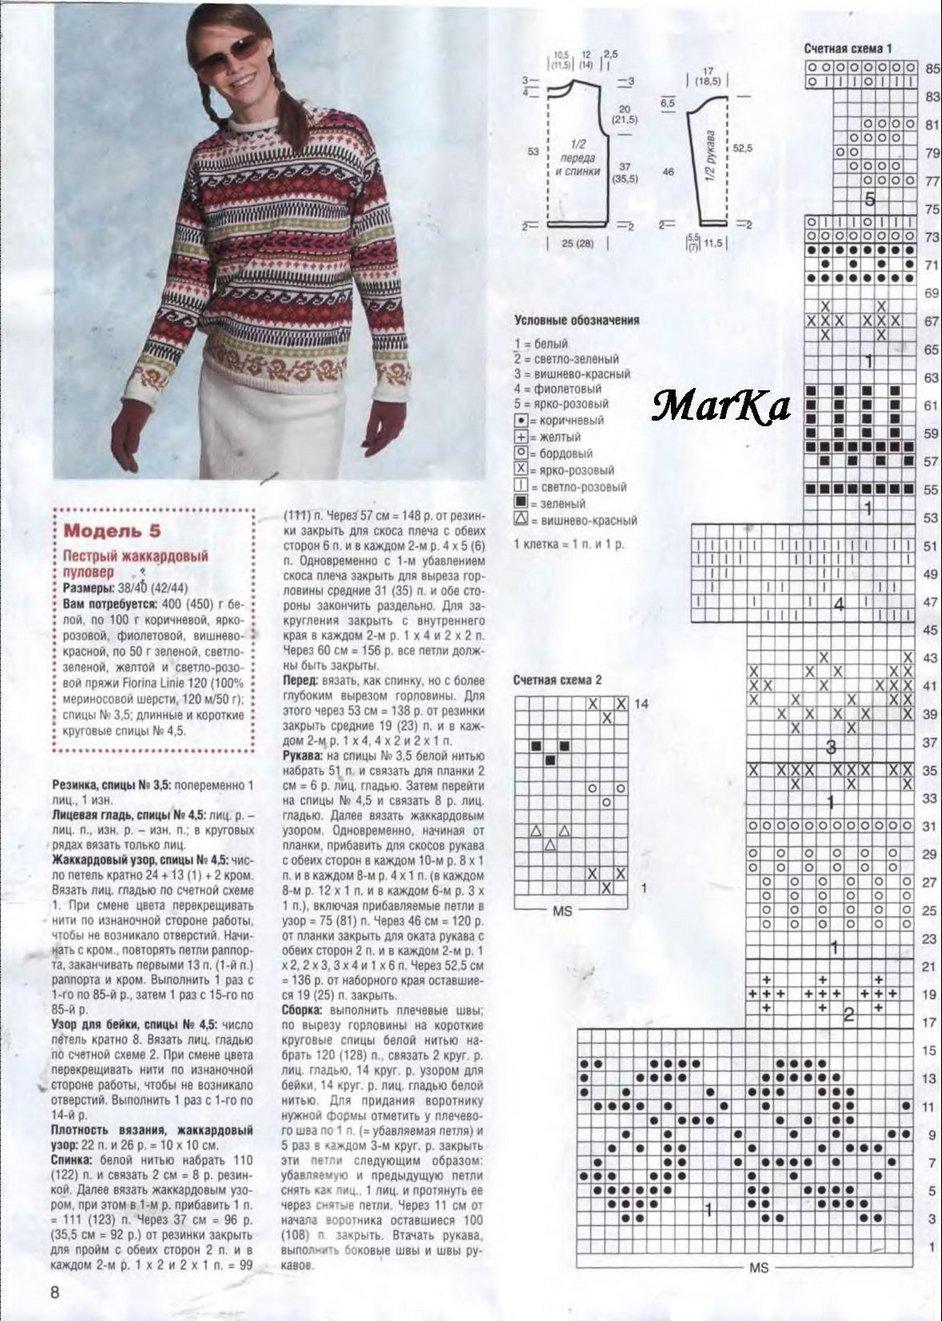 Пестрый жаккардовый пуловер